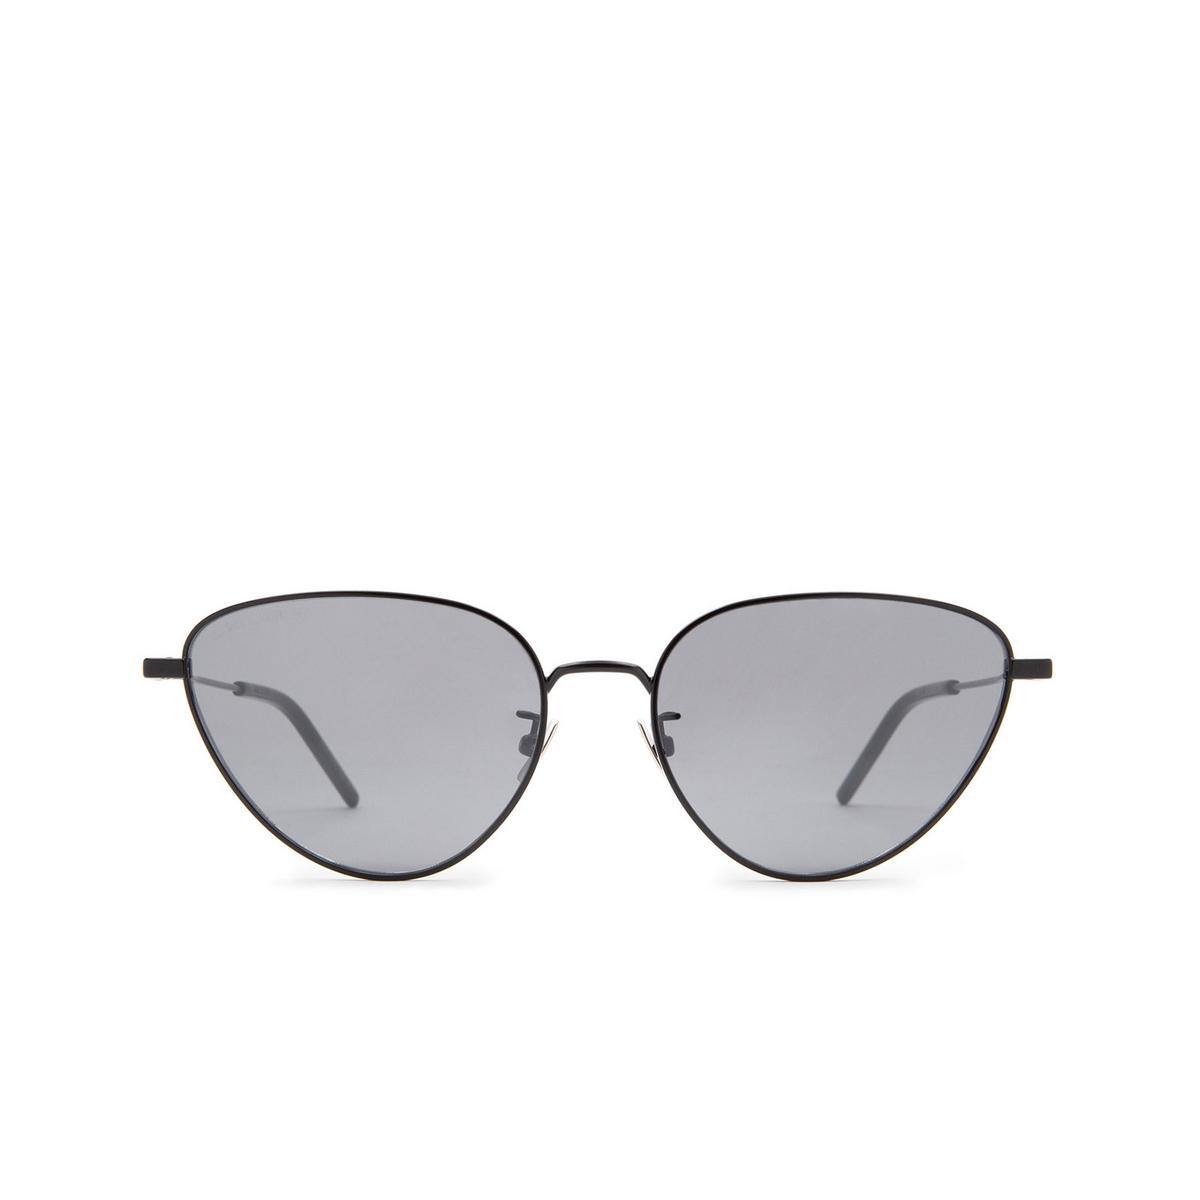 Saint Laurent® Irregular Sunglasses: SL 310 color Black 005 - 1/3.